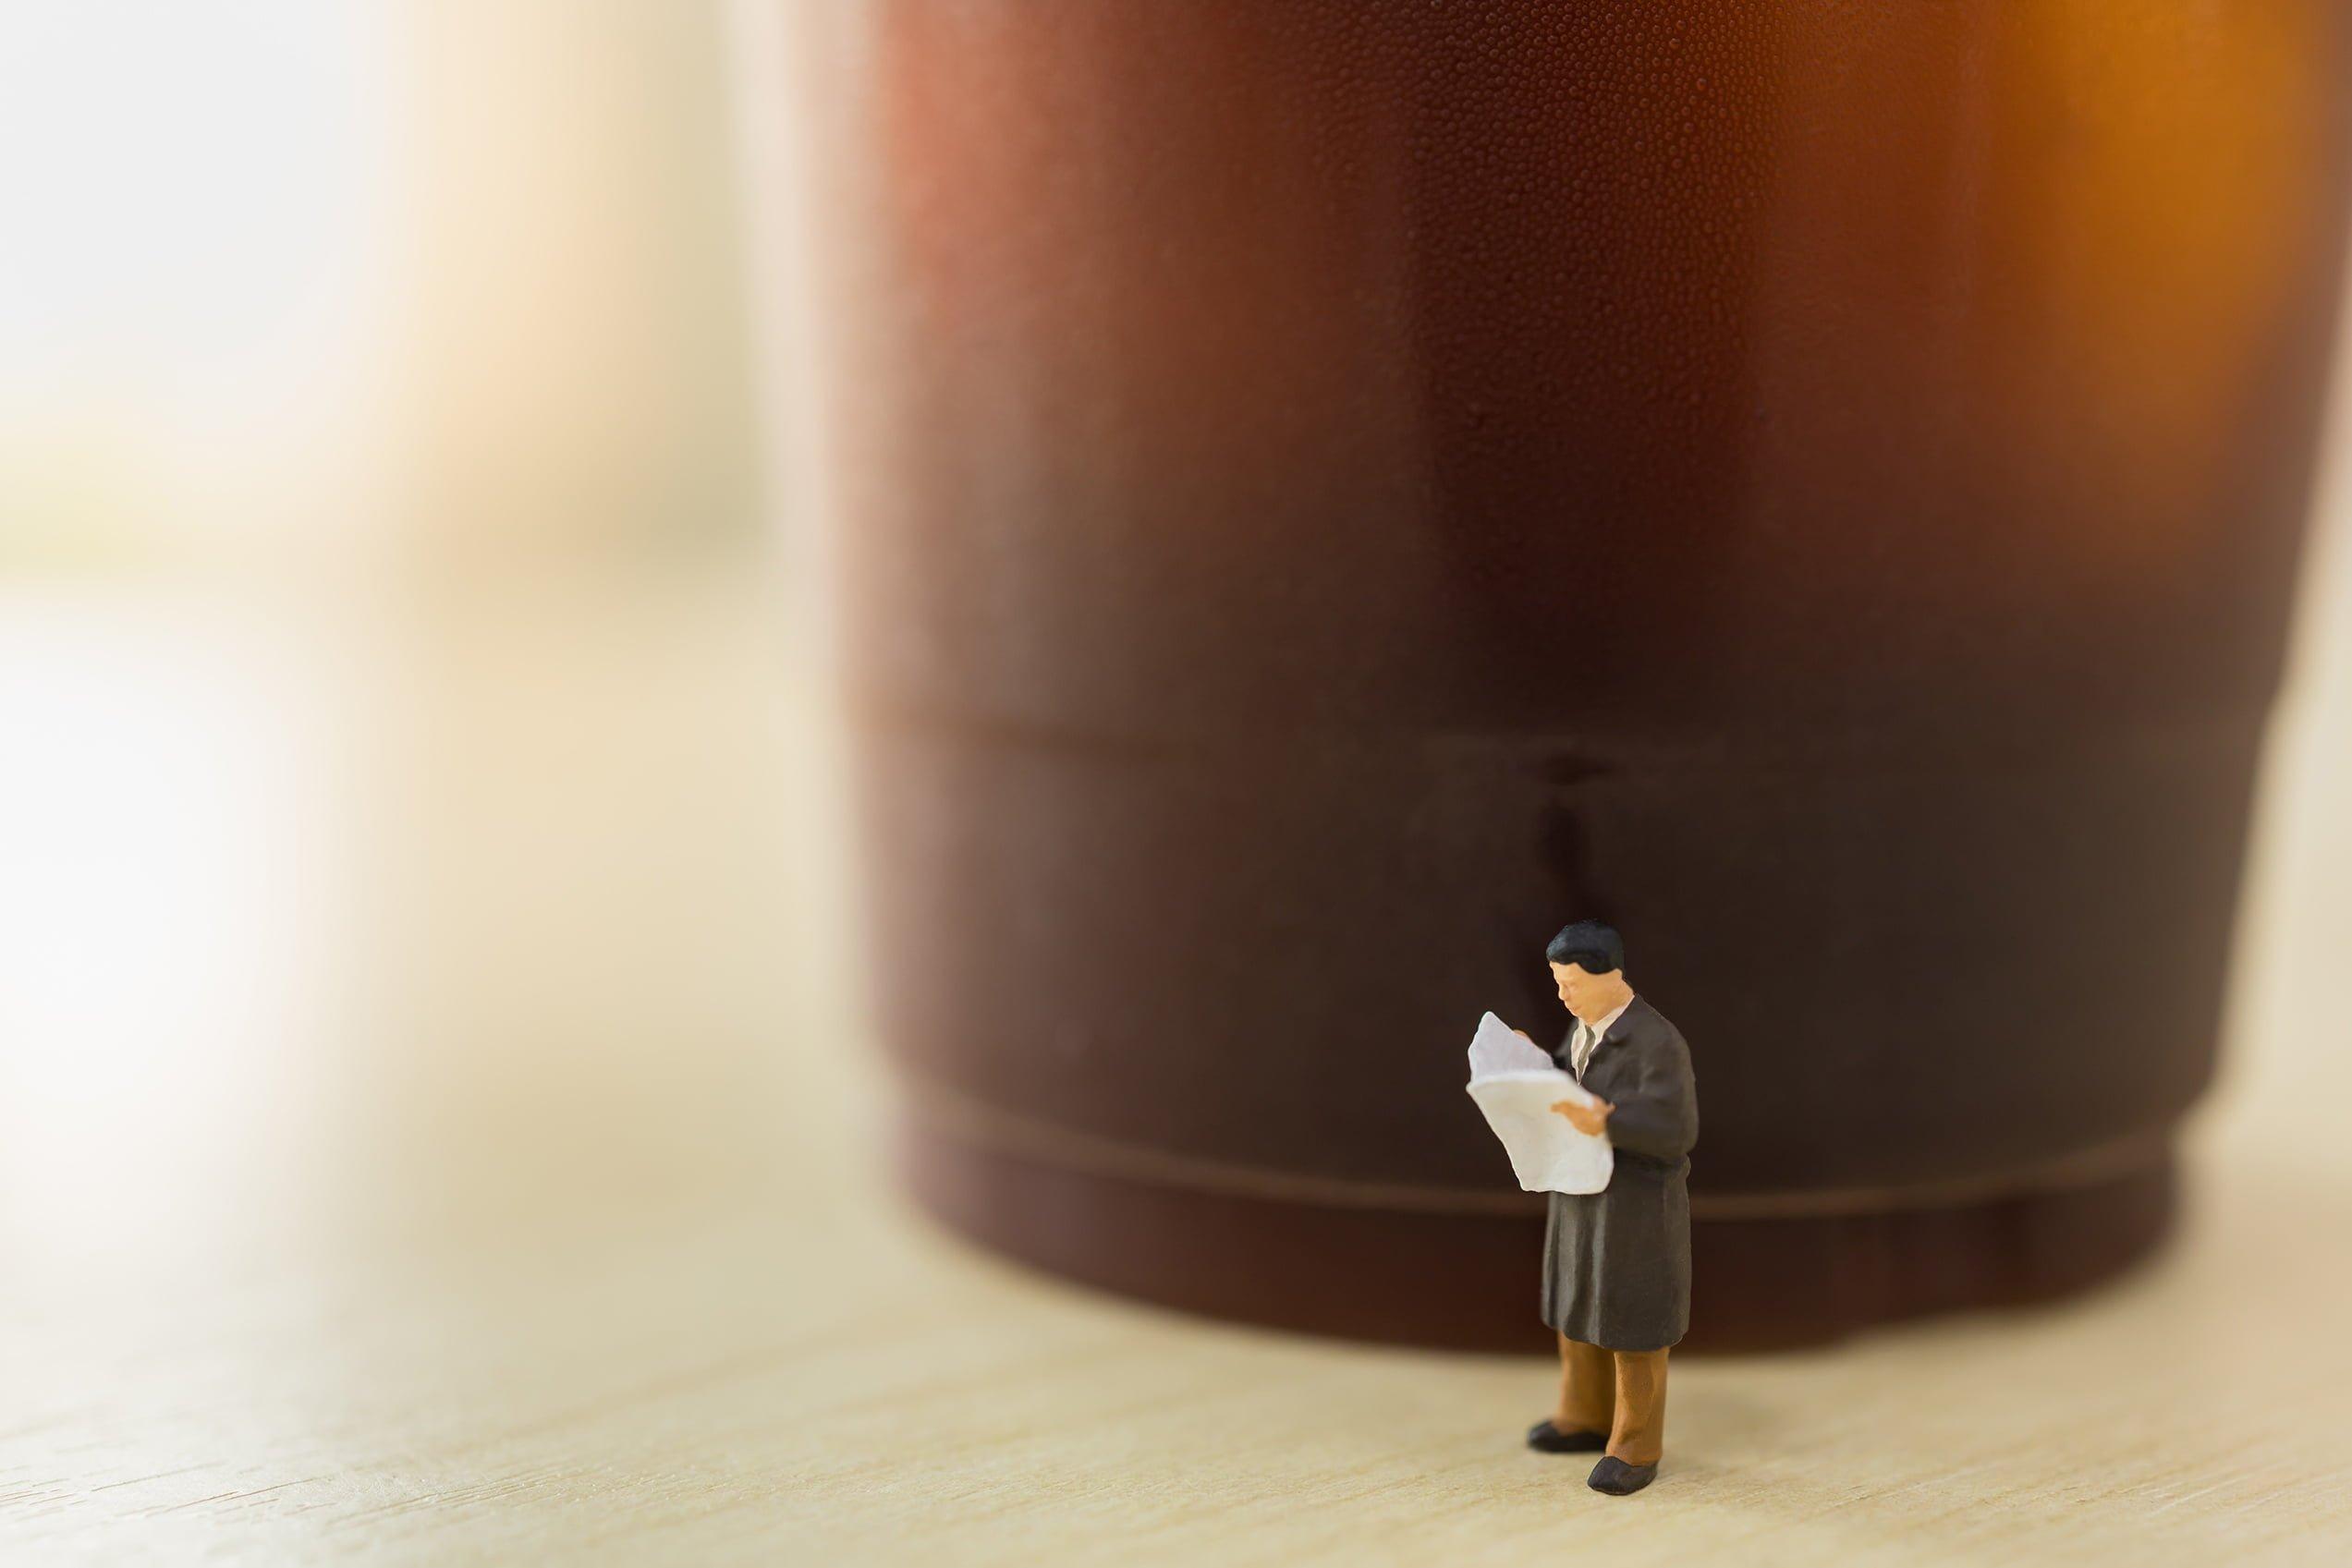 Confinamiento: un buen momento para probar bebidas desalcoholizadas